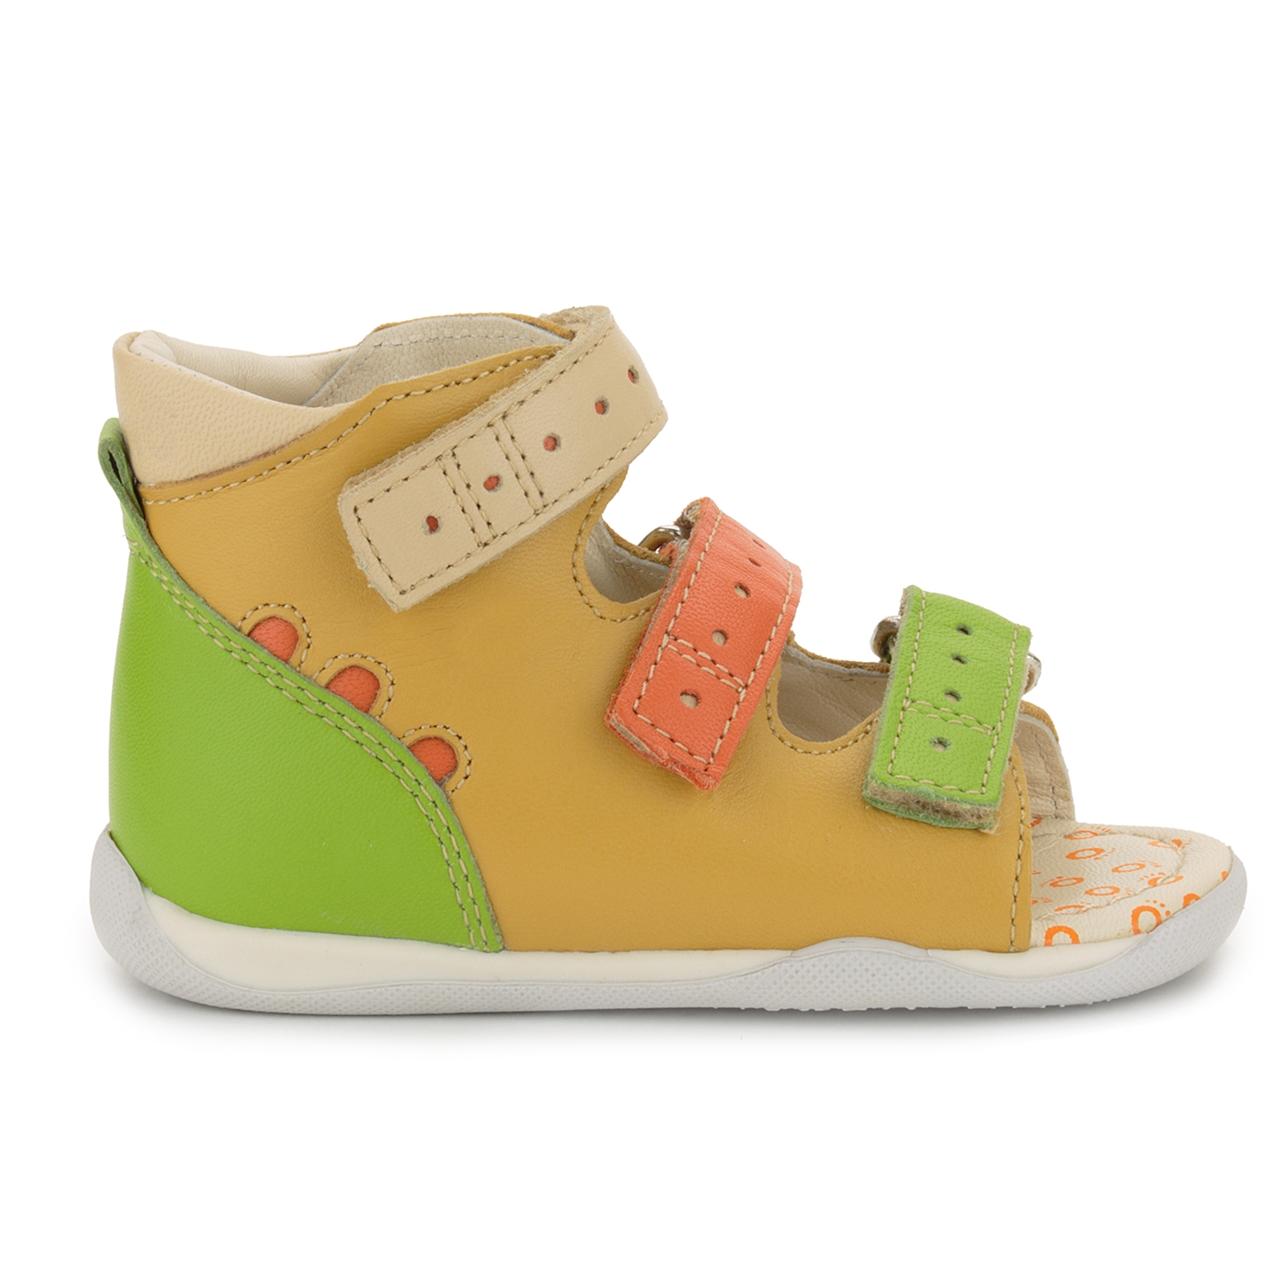 Memo Shoes Memo Dino 3ma Yellow Orange Infant Amp Toddler